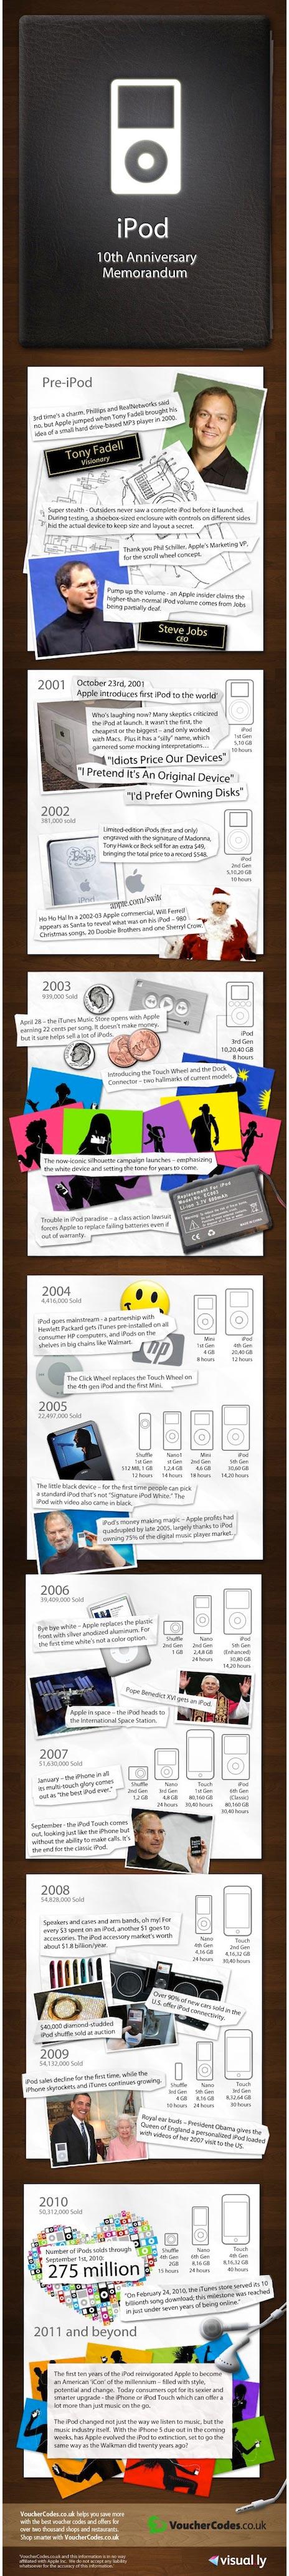 1o Jahre iPod - eine Infografik